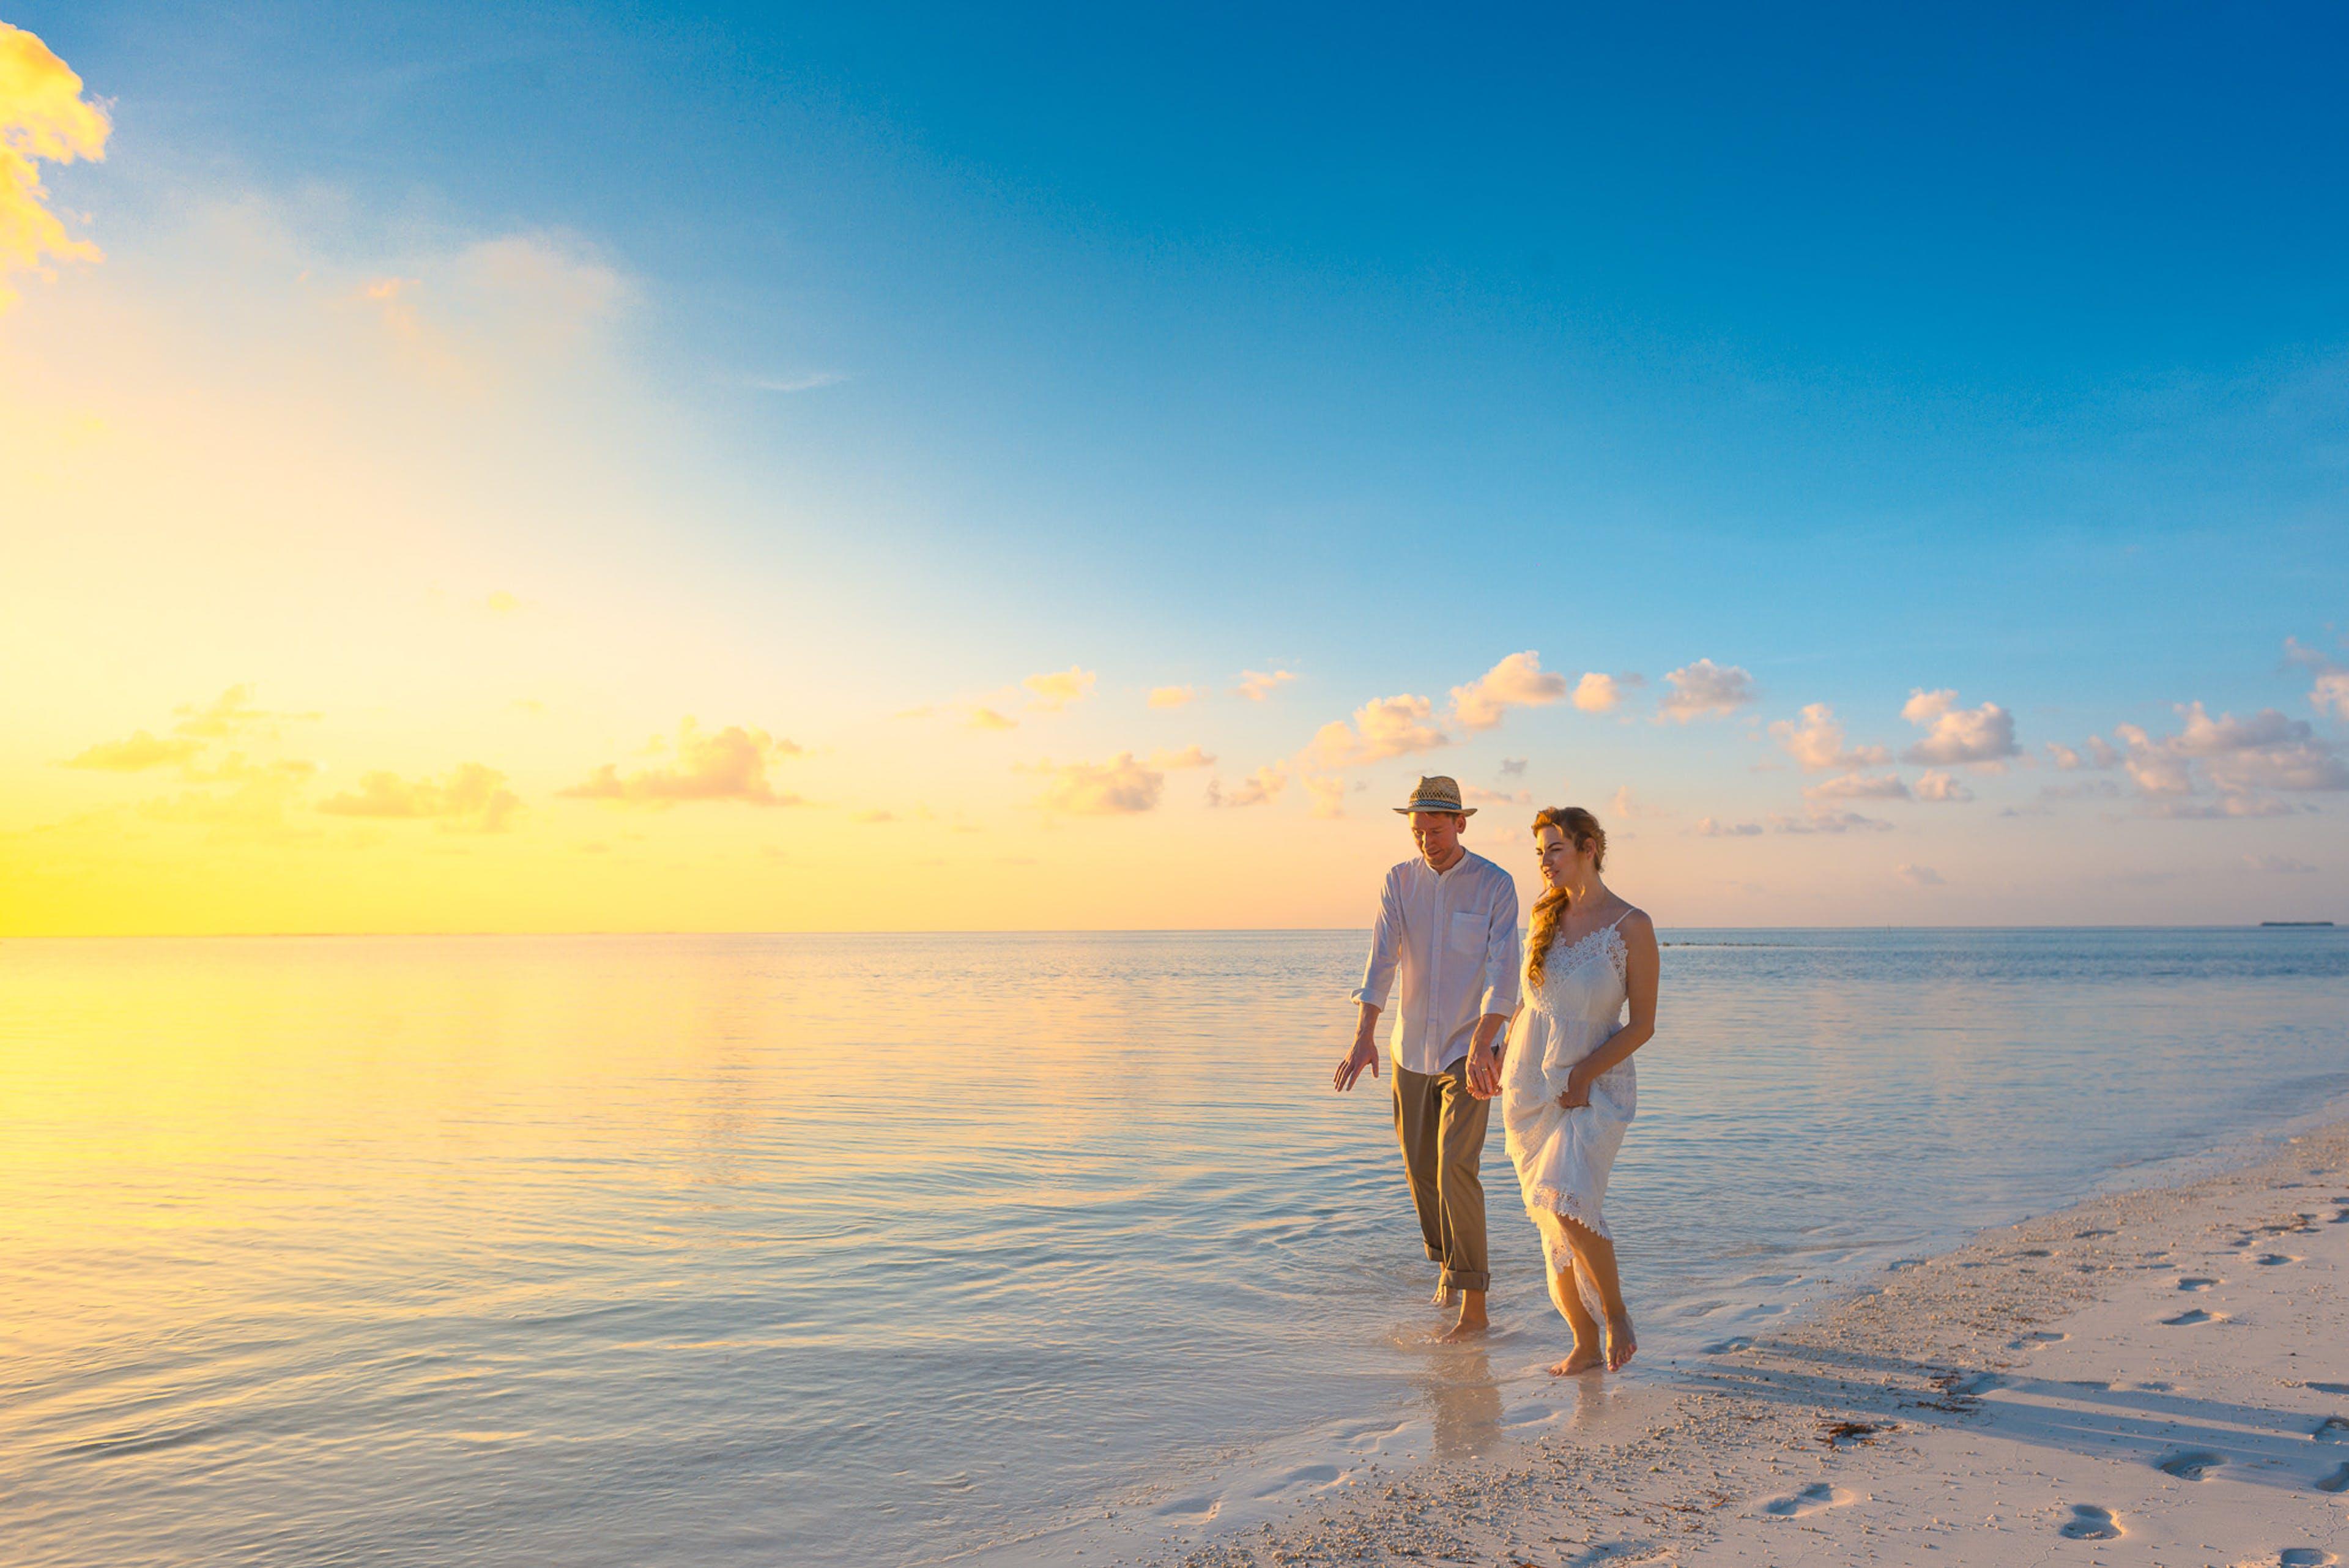 Kostenloses Stock Foto zu meer, dämmerung, sonnenuntergang, strand